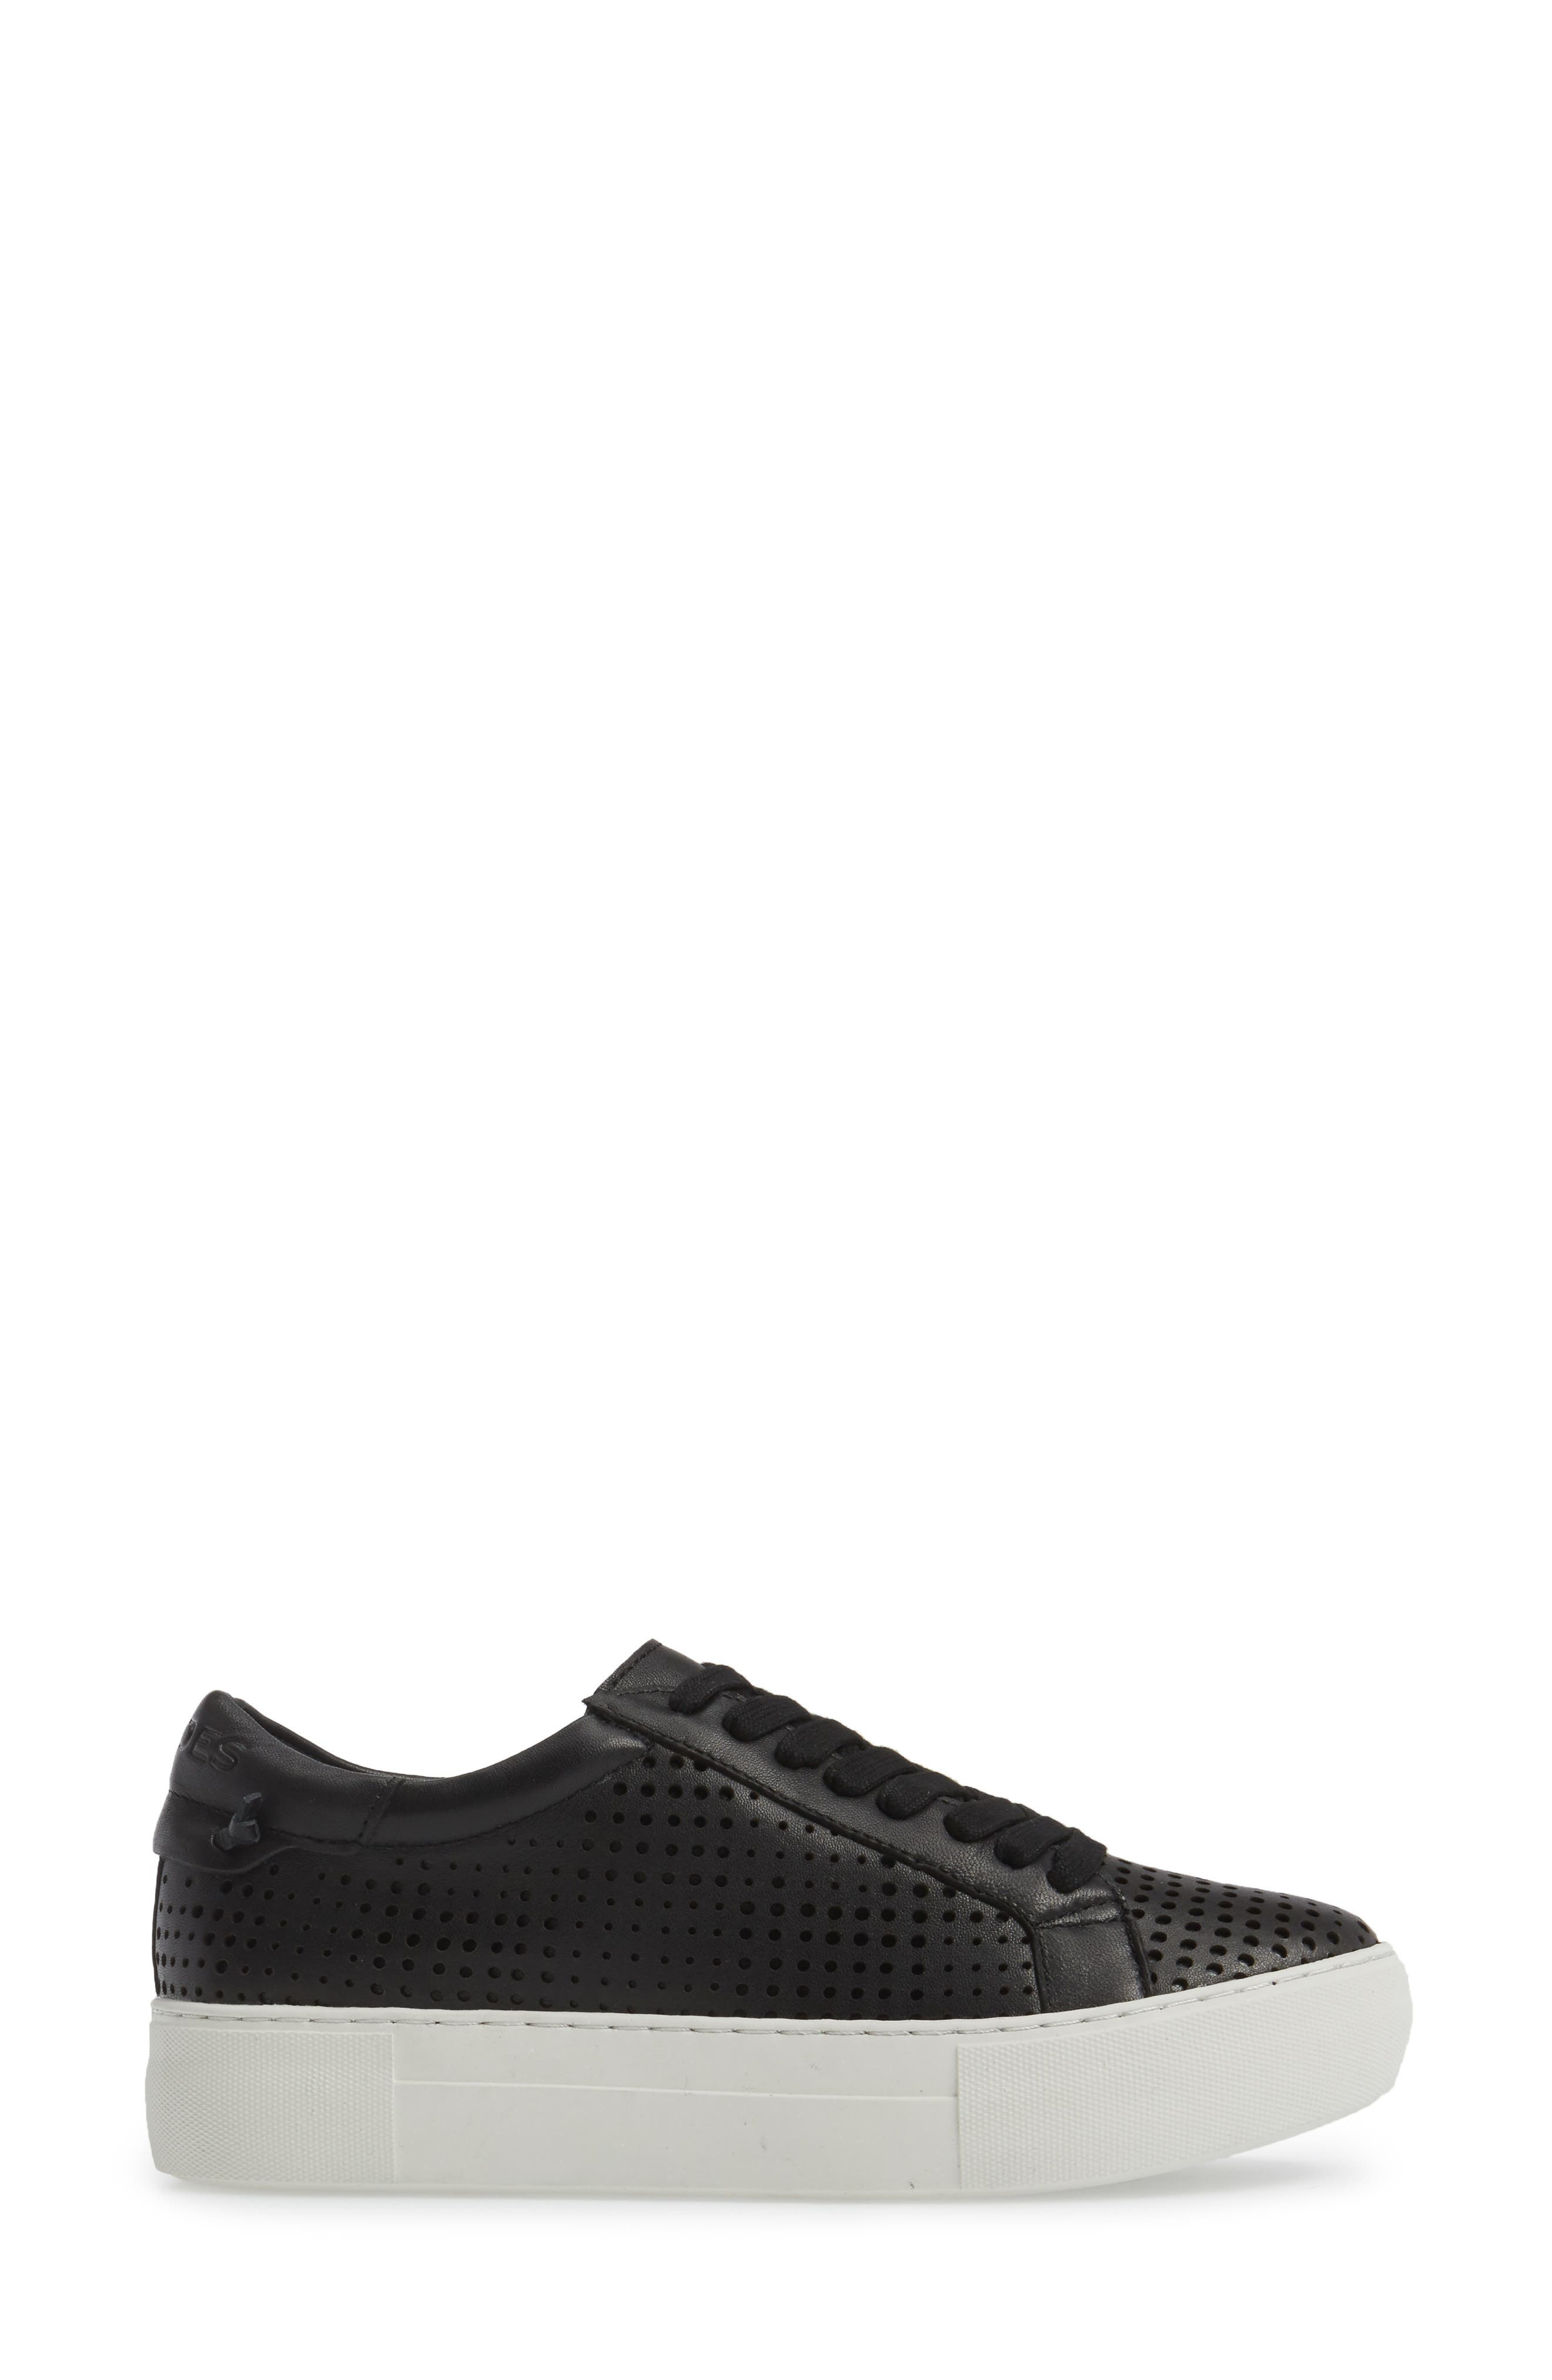 Audrina Platform Sneaker,                             Alternate thumbnail 3, color,                             015